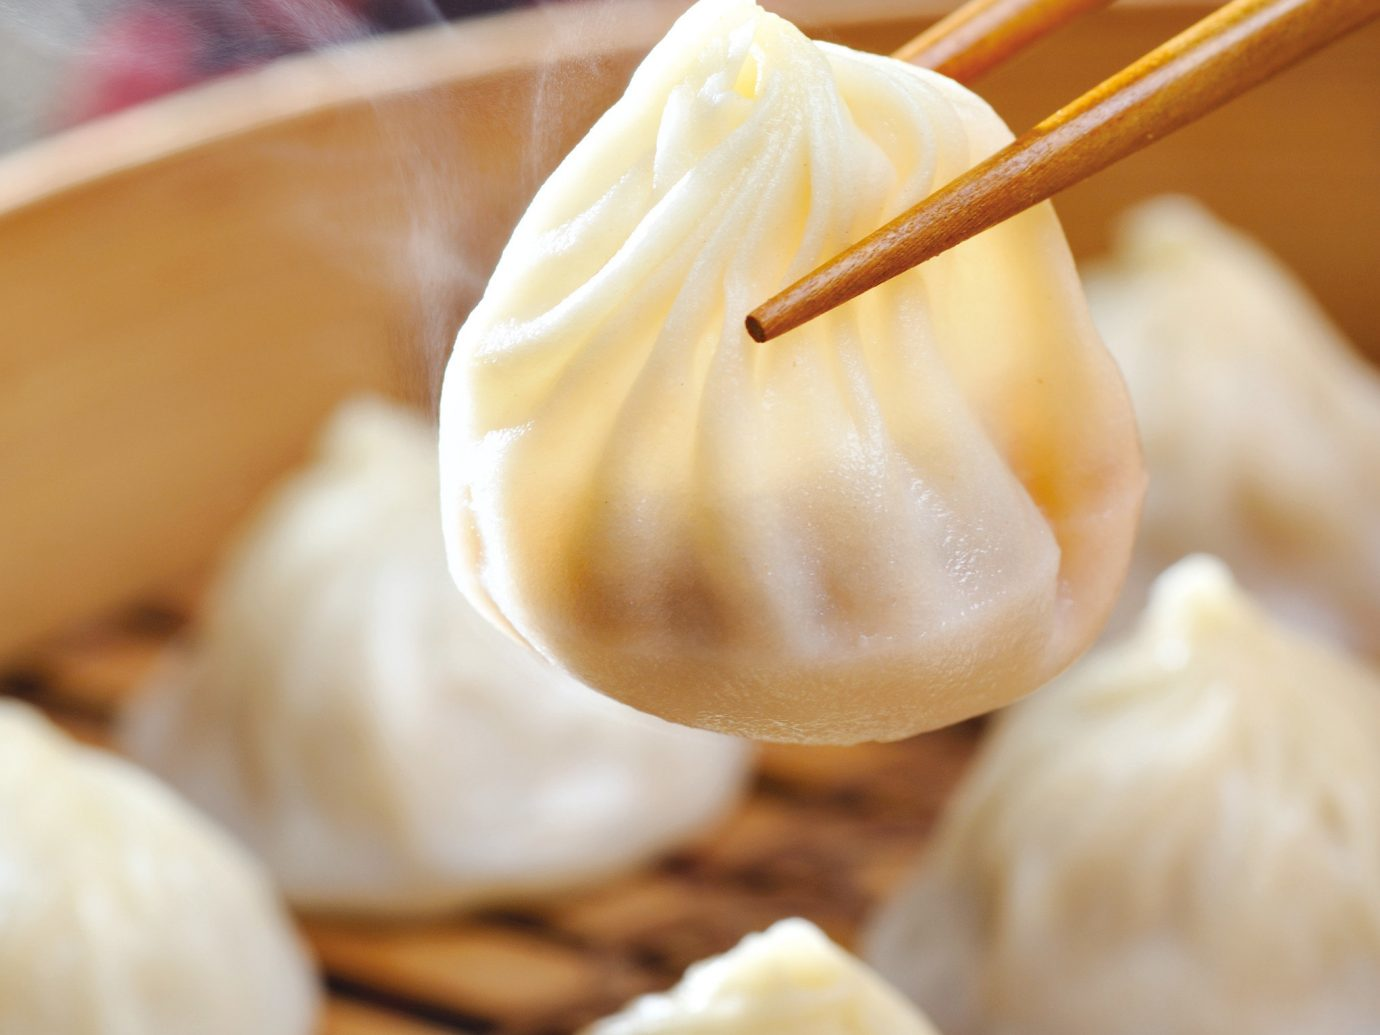 Food + Drink food dish xiaolongbao plate khinkali cuisine indoor chinese food dessert asian food dumpling dim sum pastry meal momo flavor